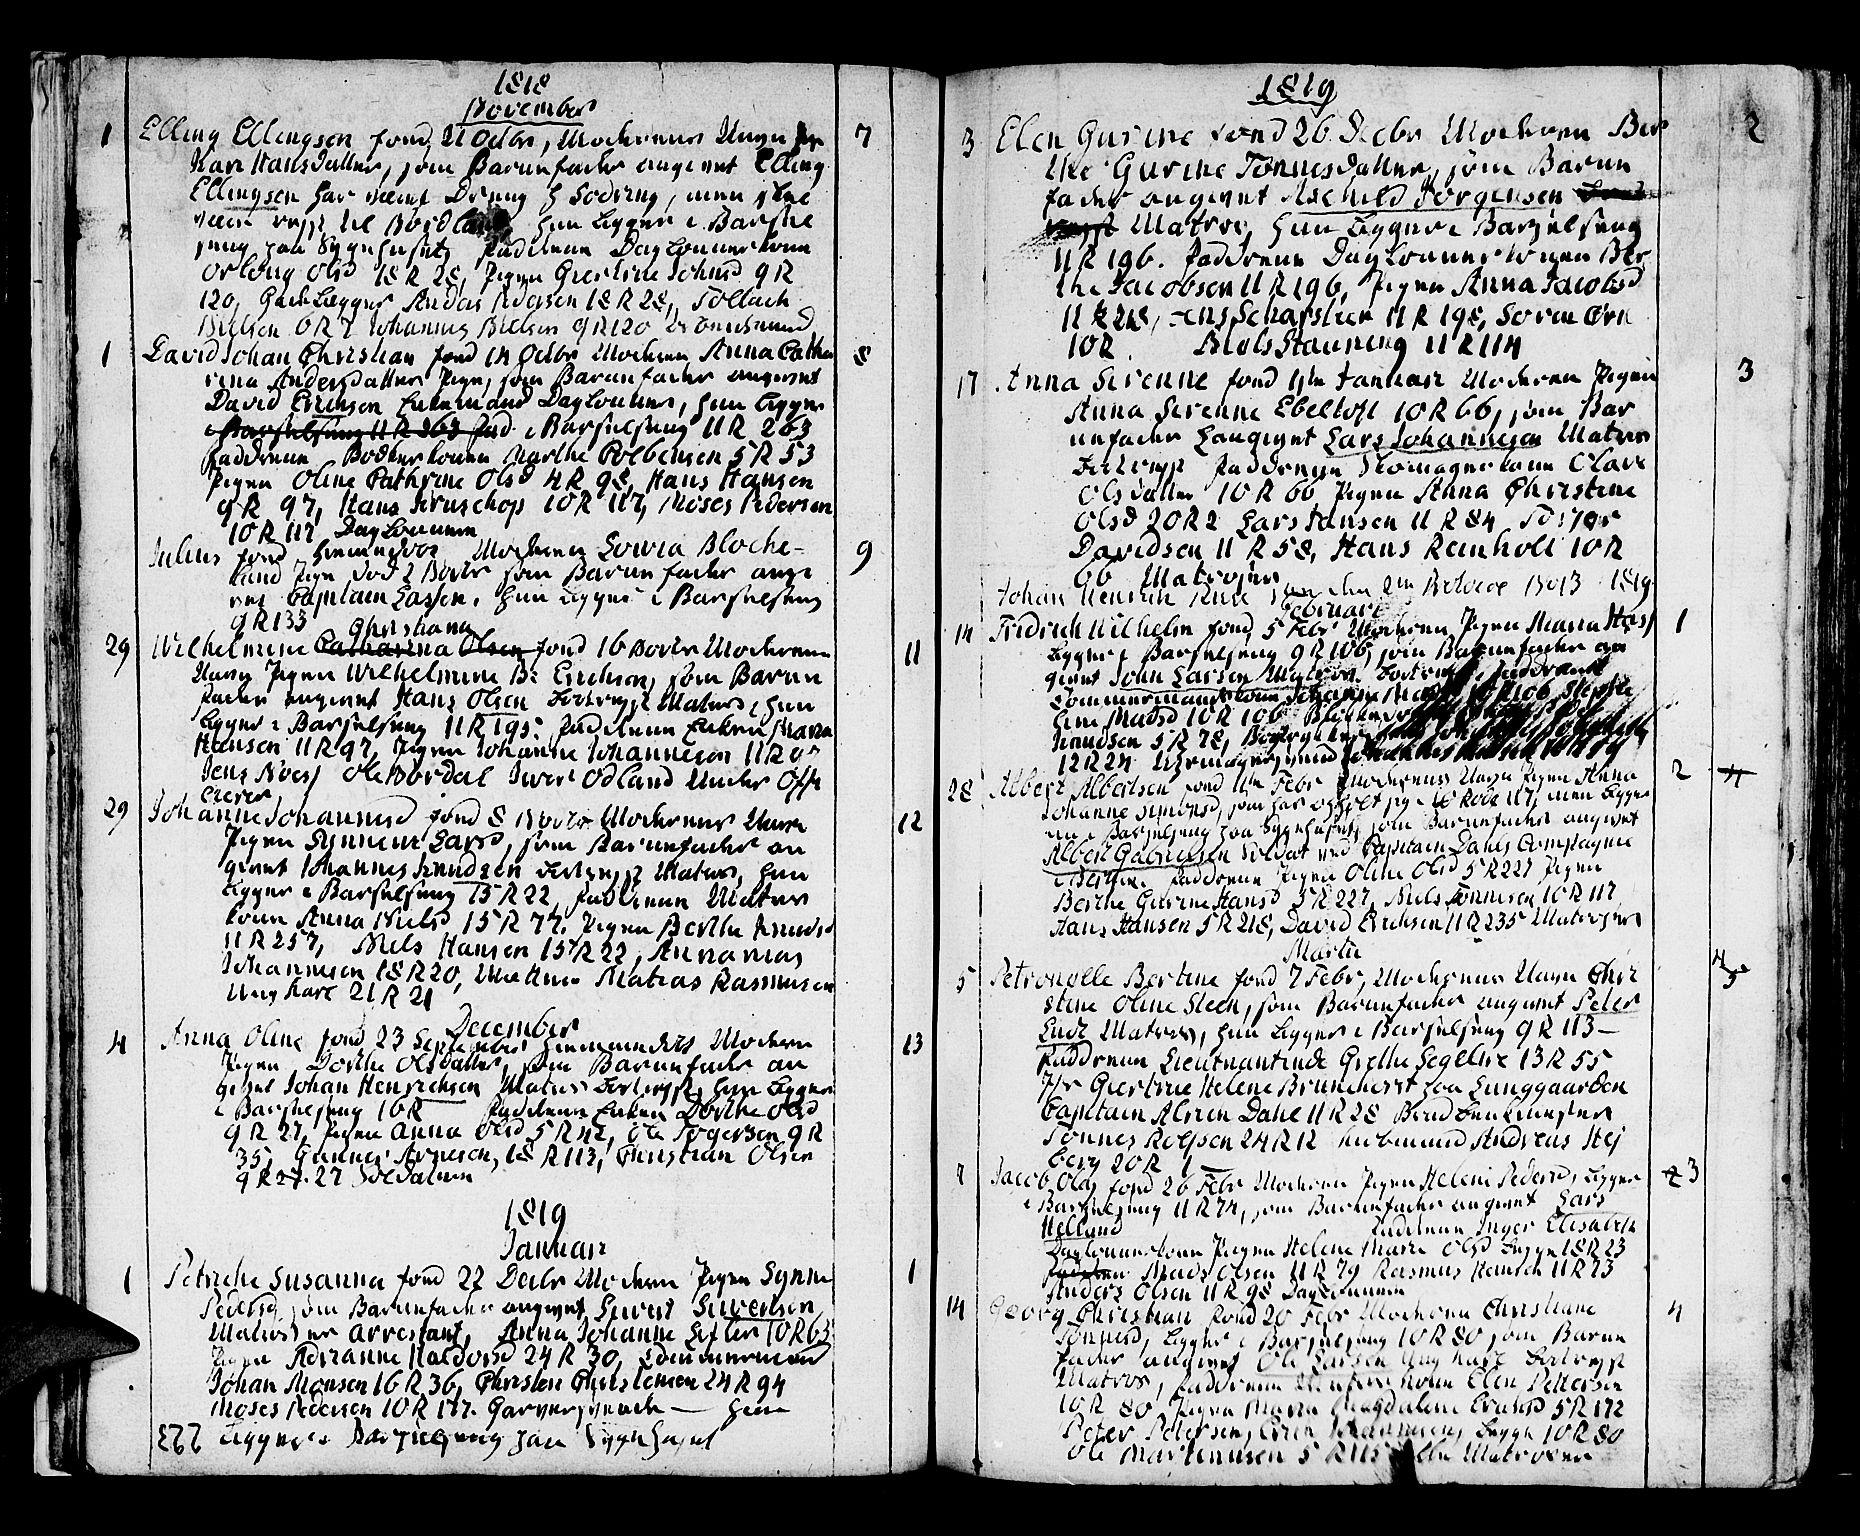 SAB, Domkirken Sokneprestembete, H/Haa/L0005: Ministerialbok nr. A 5, 1808-1820, s. 222-223